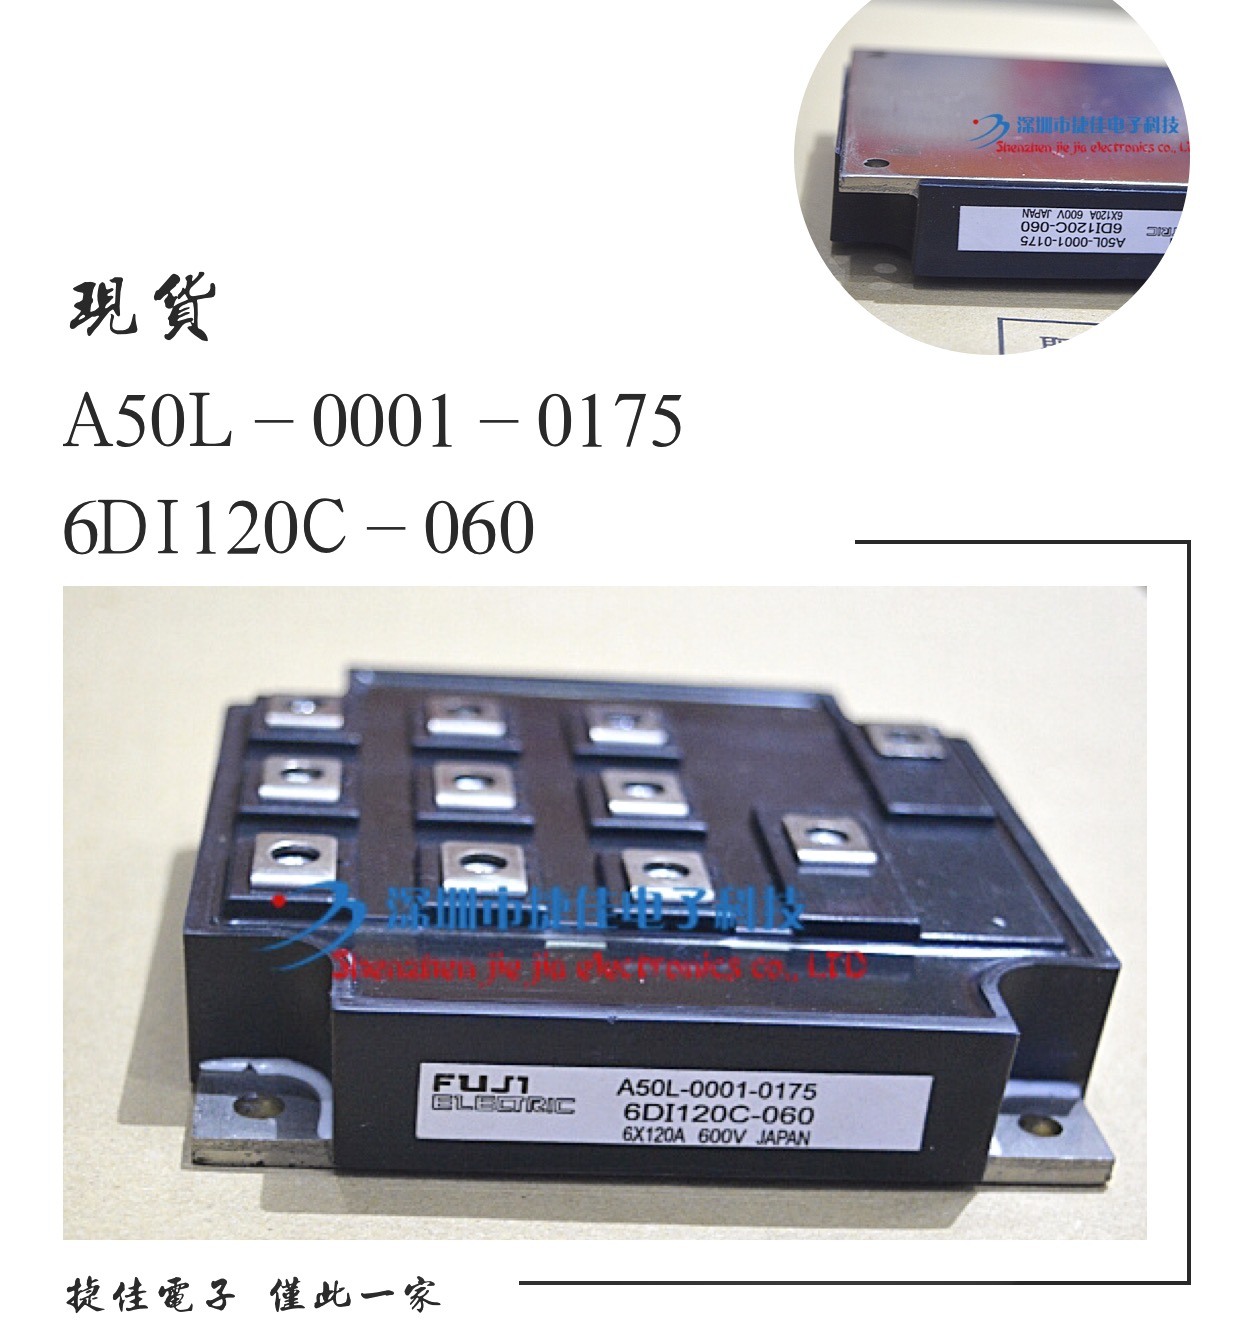 6DI150A 060 6DI120D 060 6DI120C 060 A50L 0001 0175 6MBI200FA|Car Switches & Relays| |  - title=